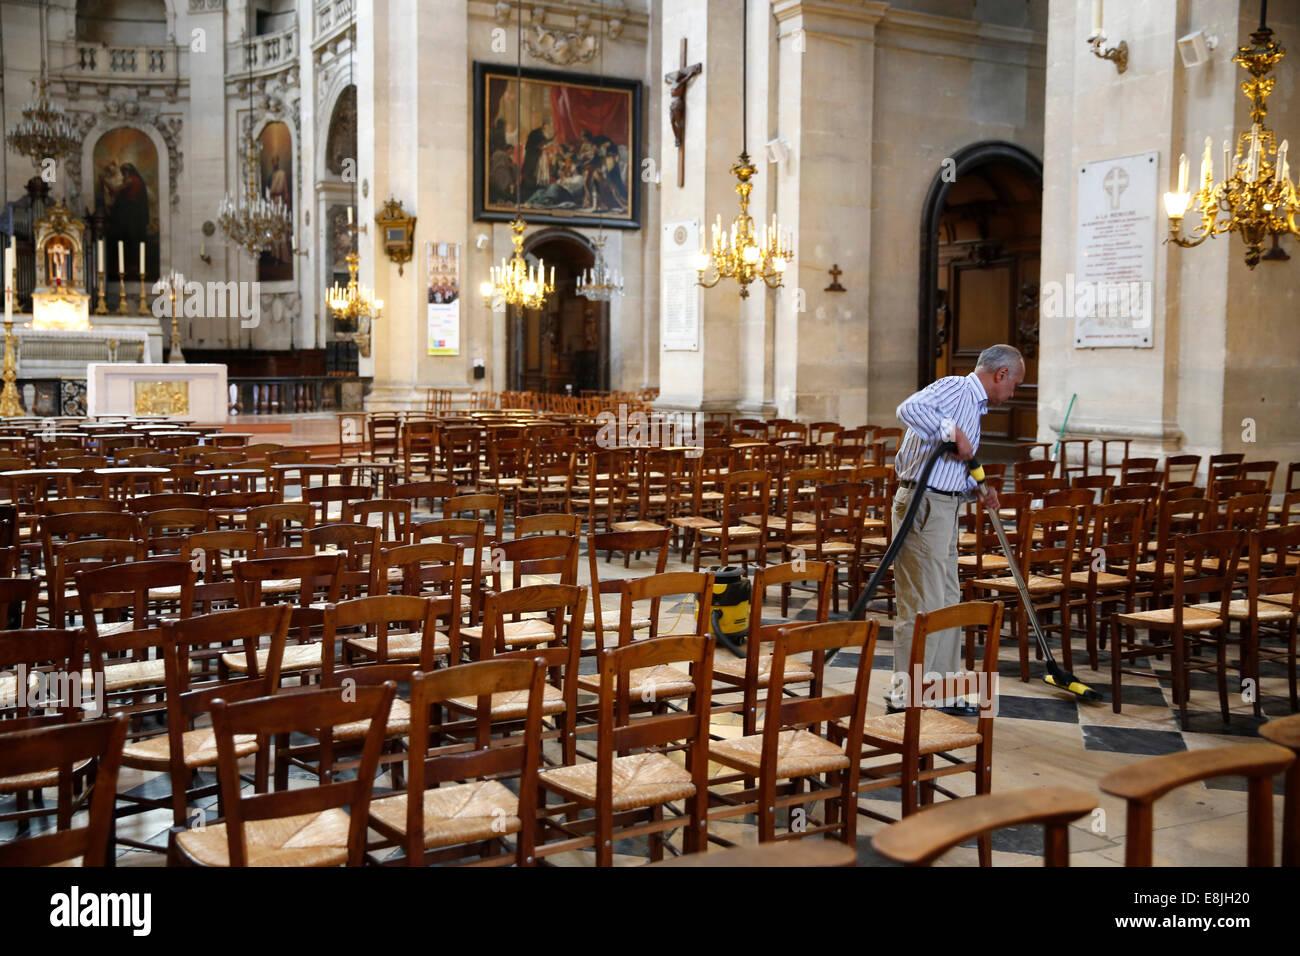 Saint-Paul church. Cleanliness. - Stock Image